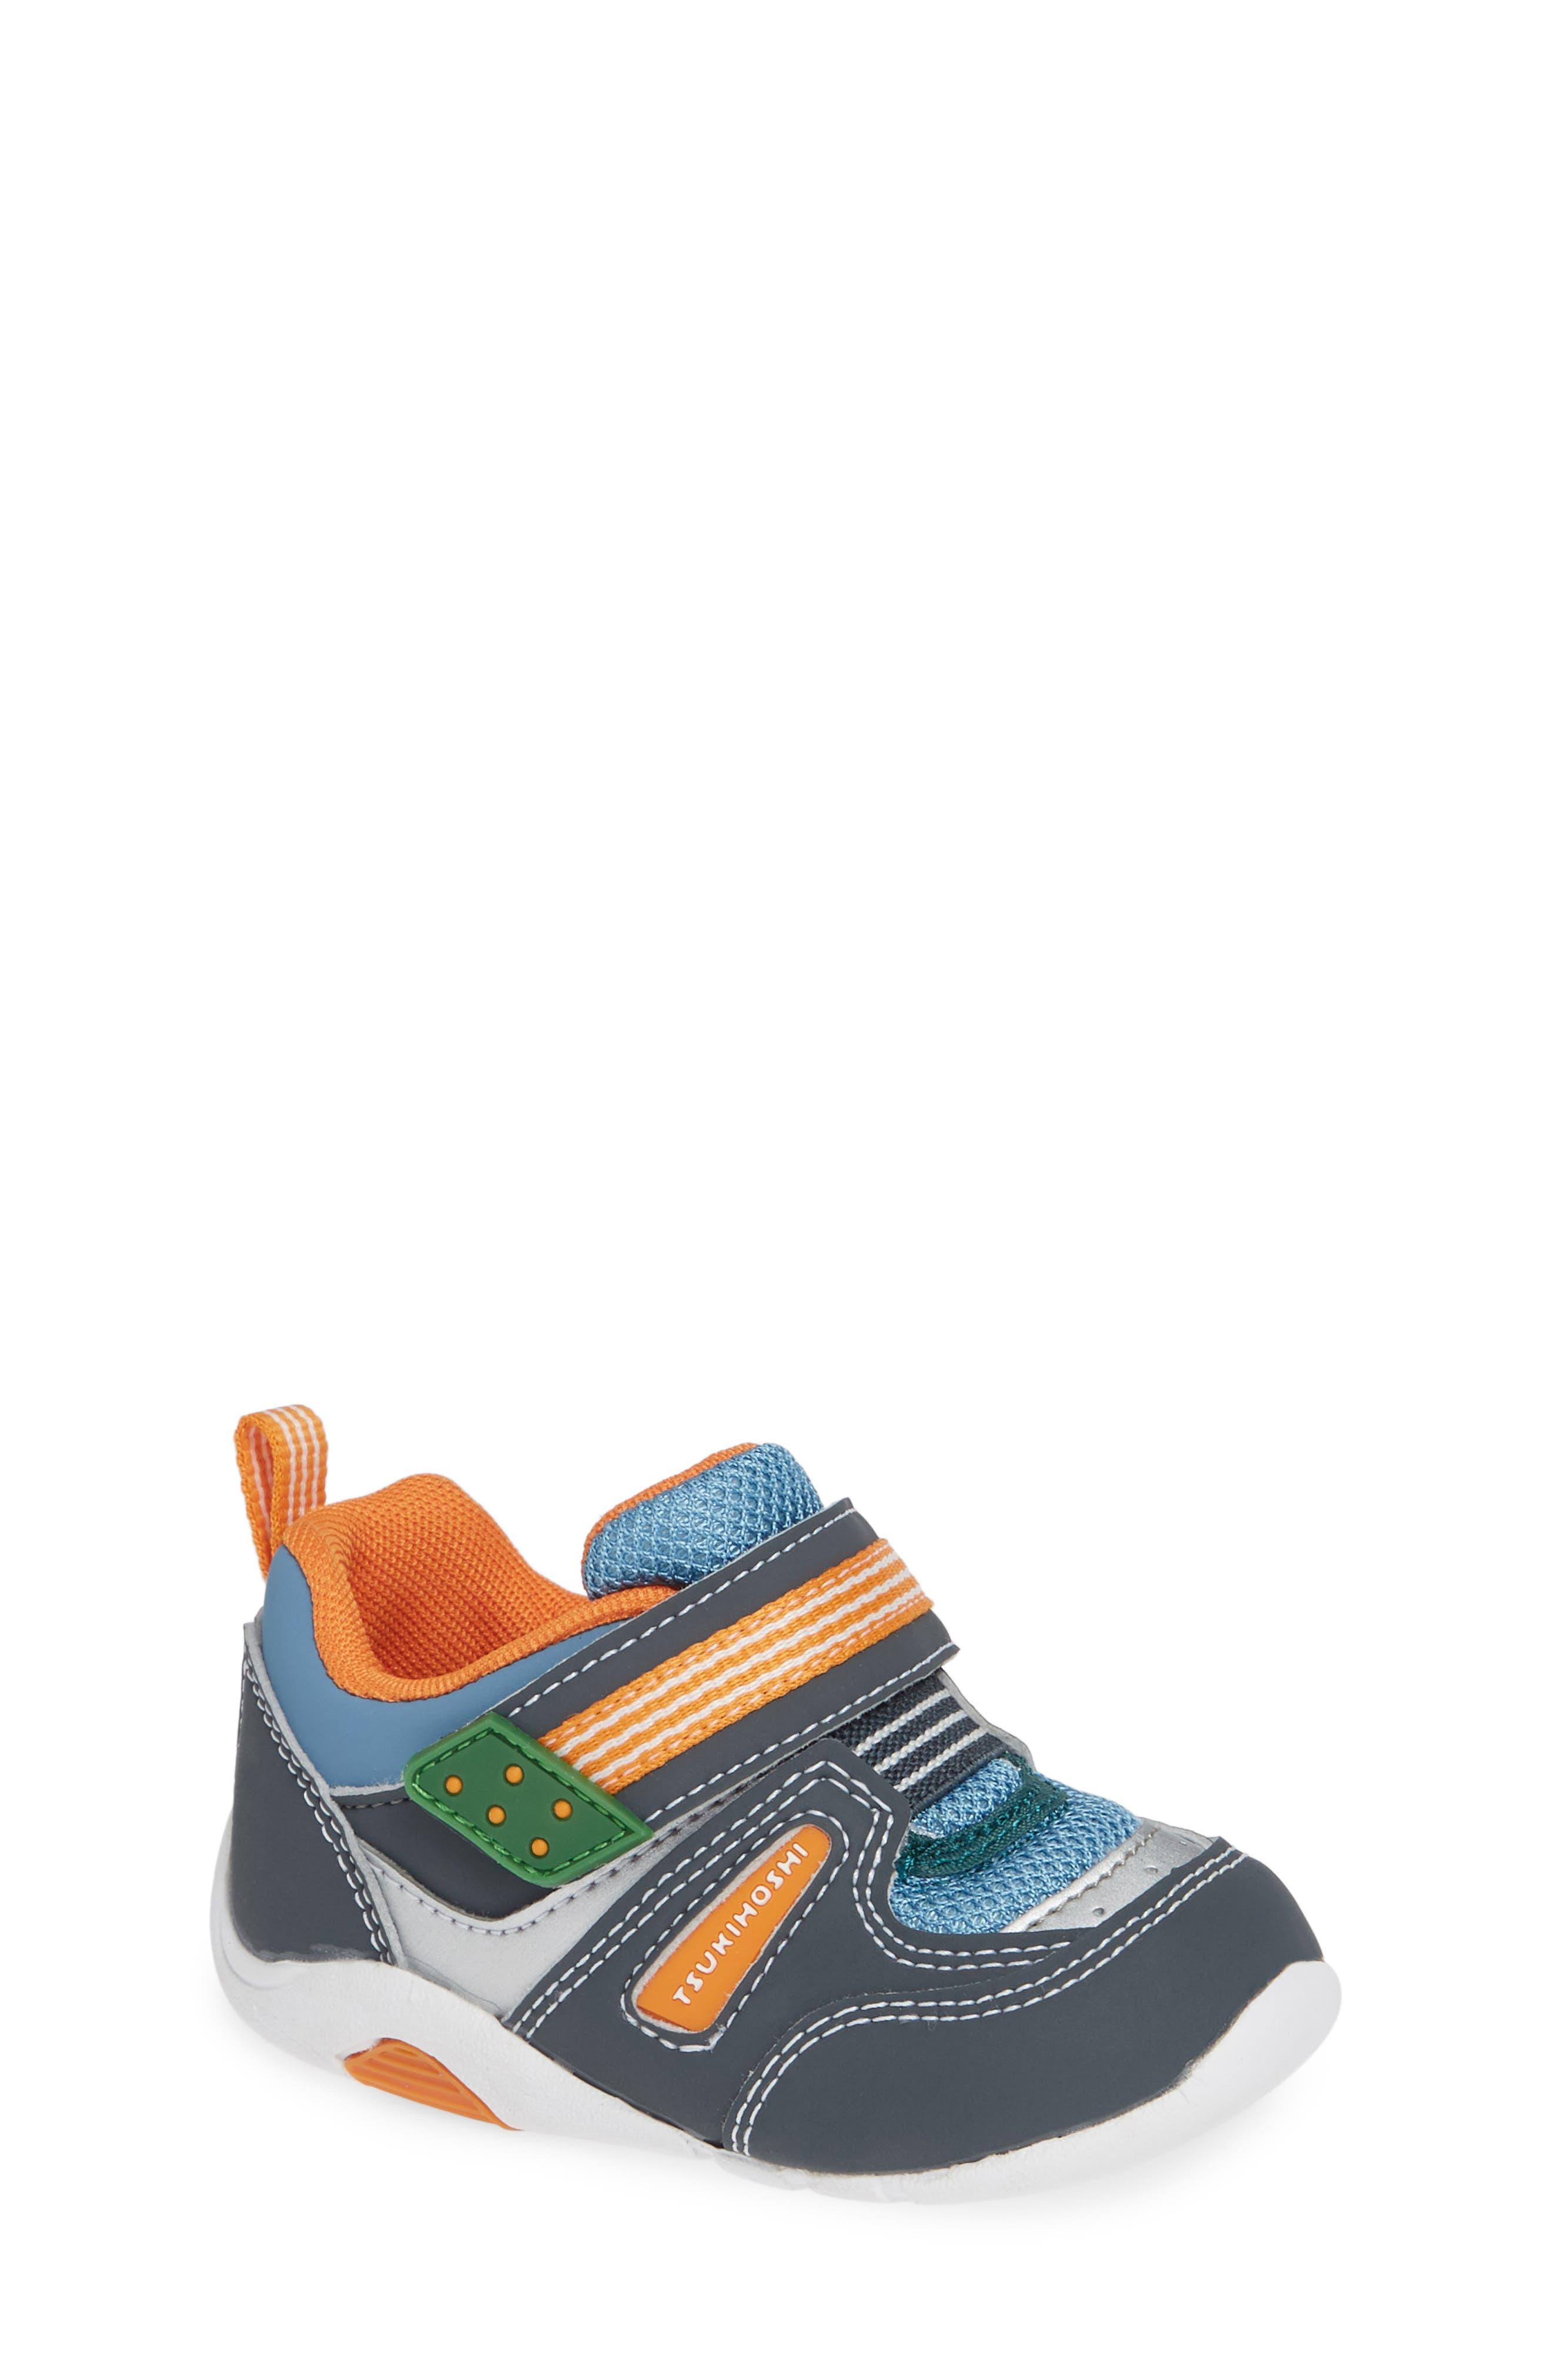 TSUKIHOSHI Neko Washable Sneaker, Main, color, CHARCOAL/ SEA